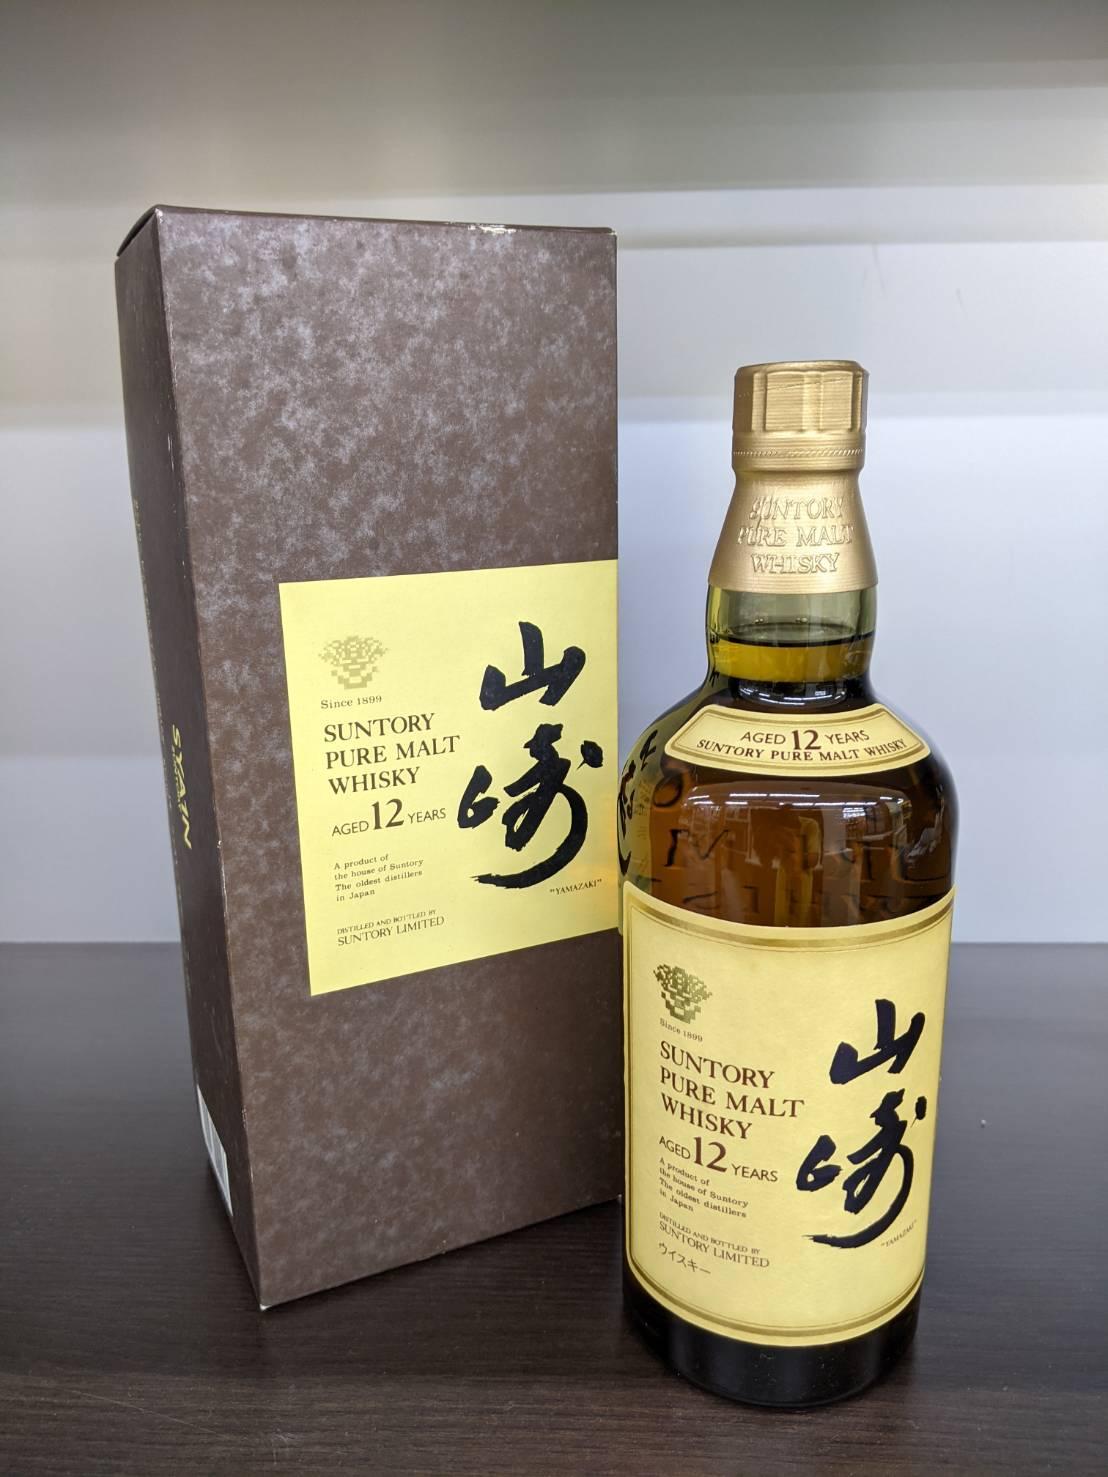 【SUNTORY サントリー 山崎 12年 ピュアモルト ウイスキー 750ml 古酒】を買取いたしました!の買取-